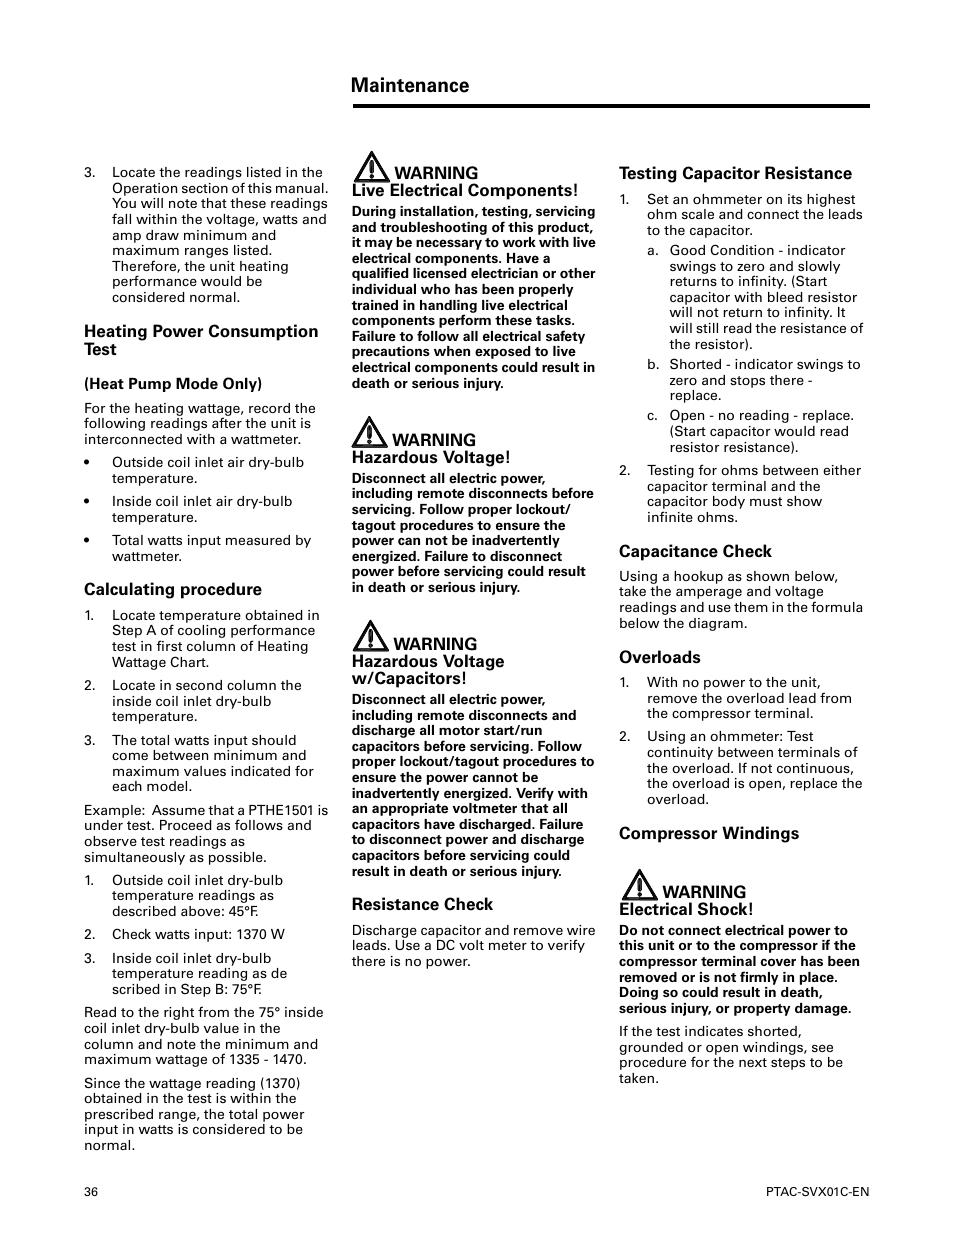 Heating power consumption test, Calculating procedure, Resistance